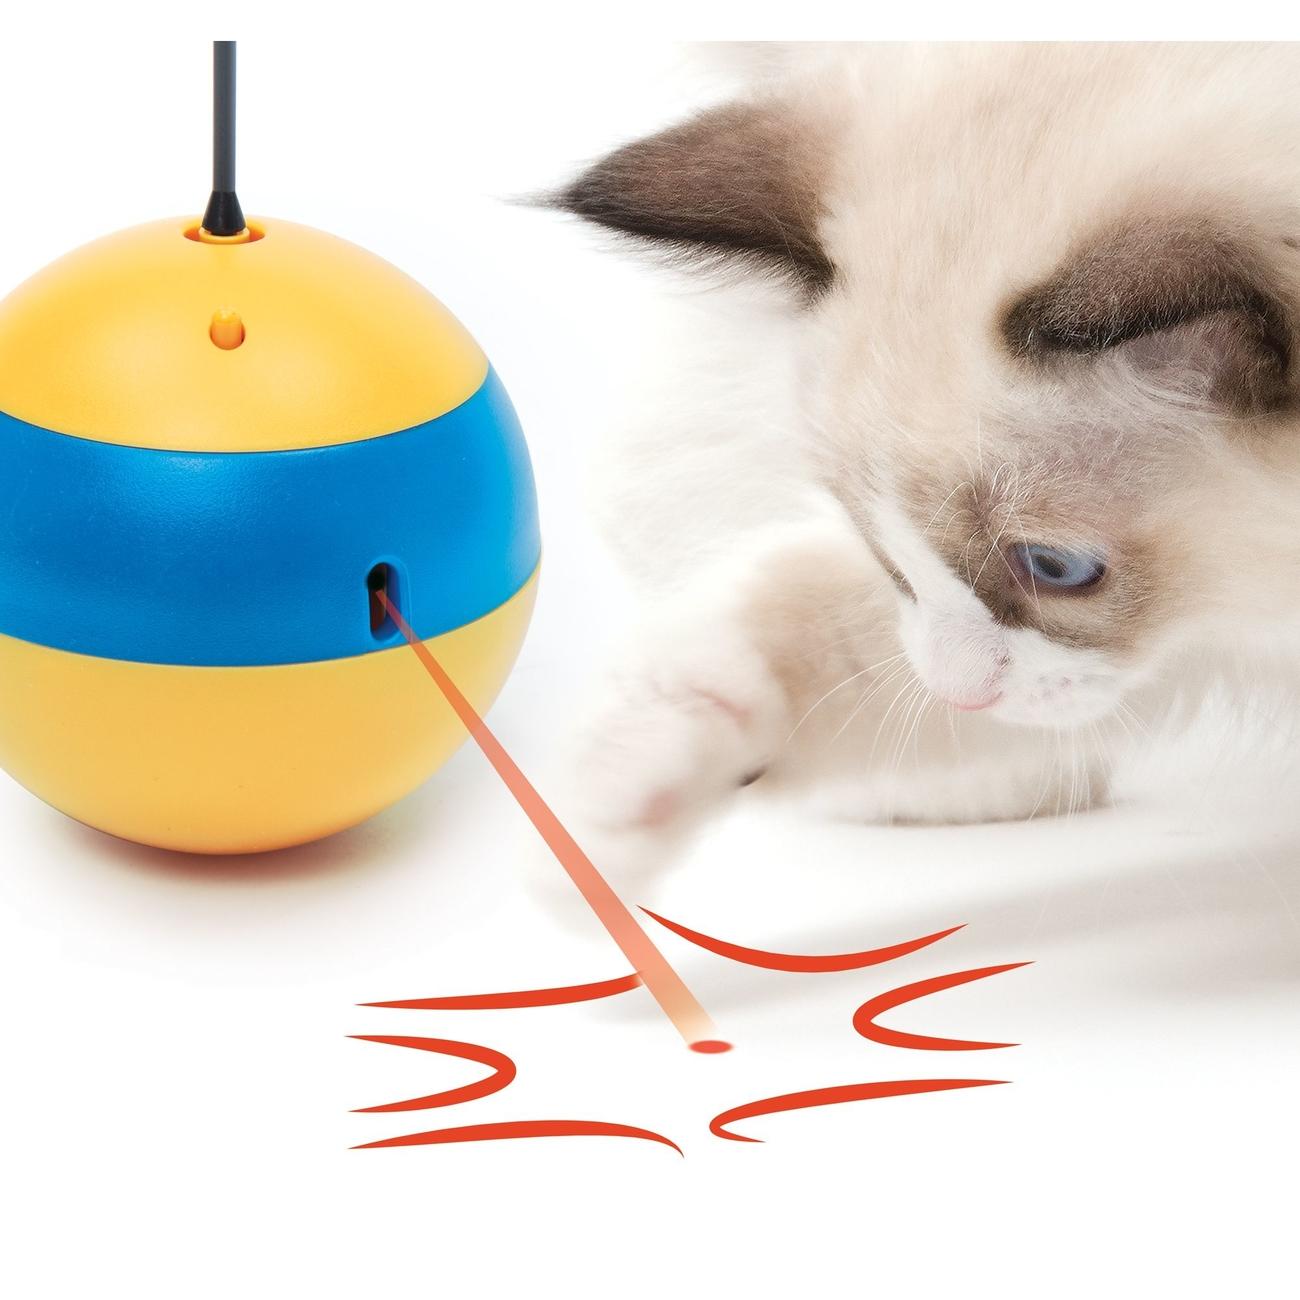 Catit Play 2.0 Tumbler Bee Laserspielzeug, Bild 3